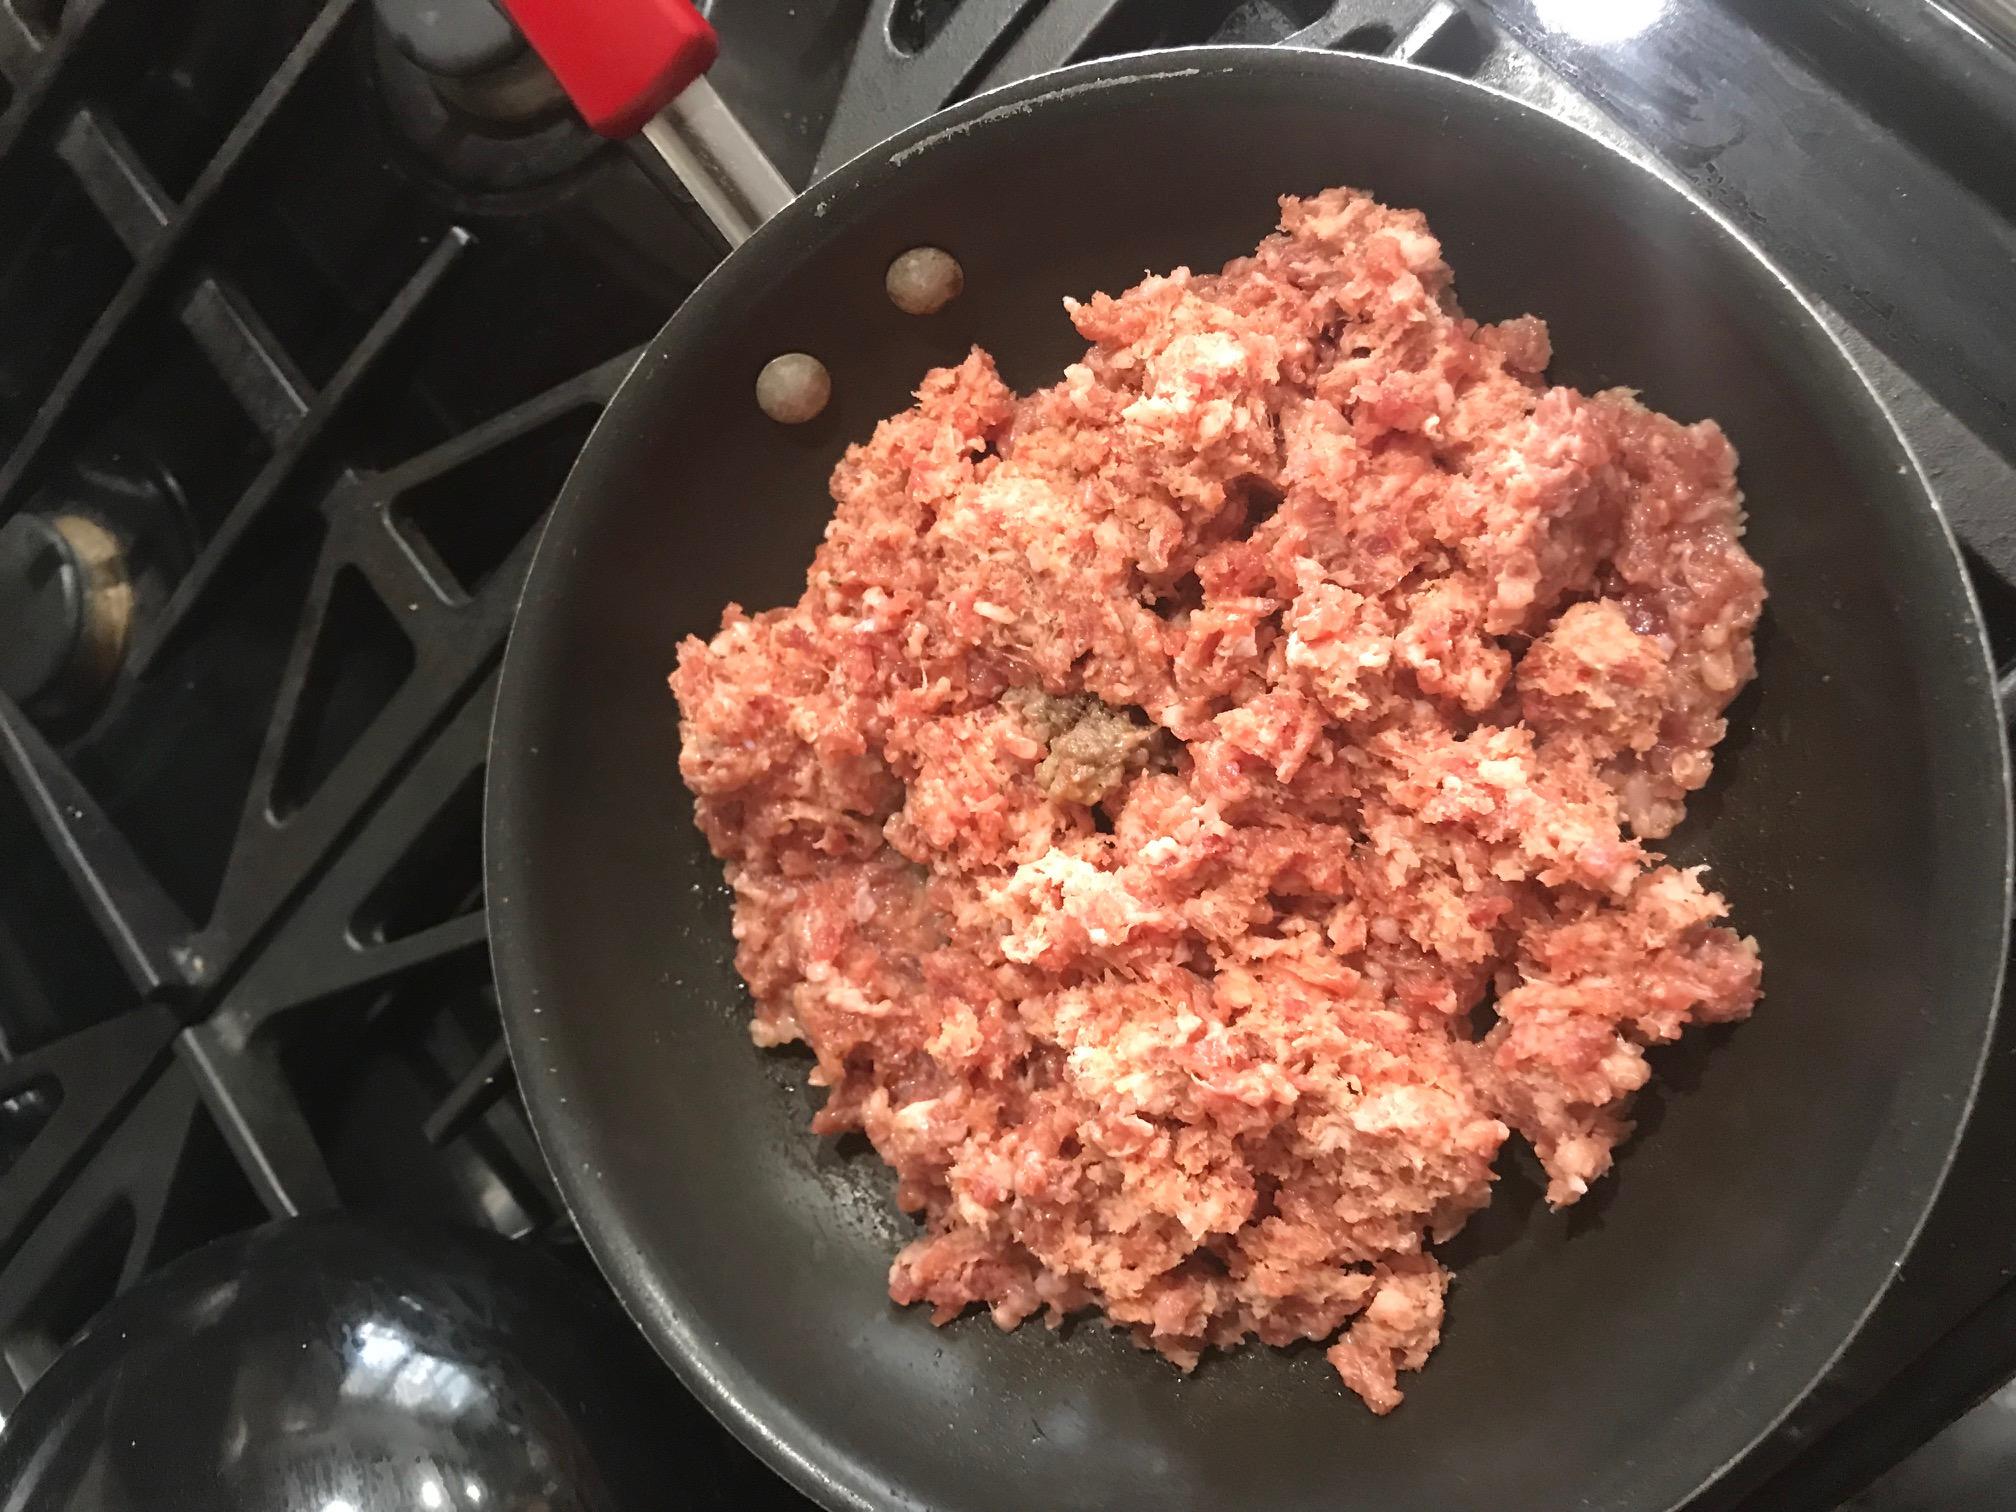 Sausage frying in a frying pan